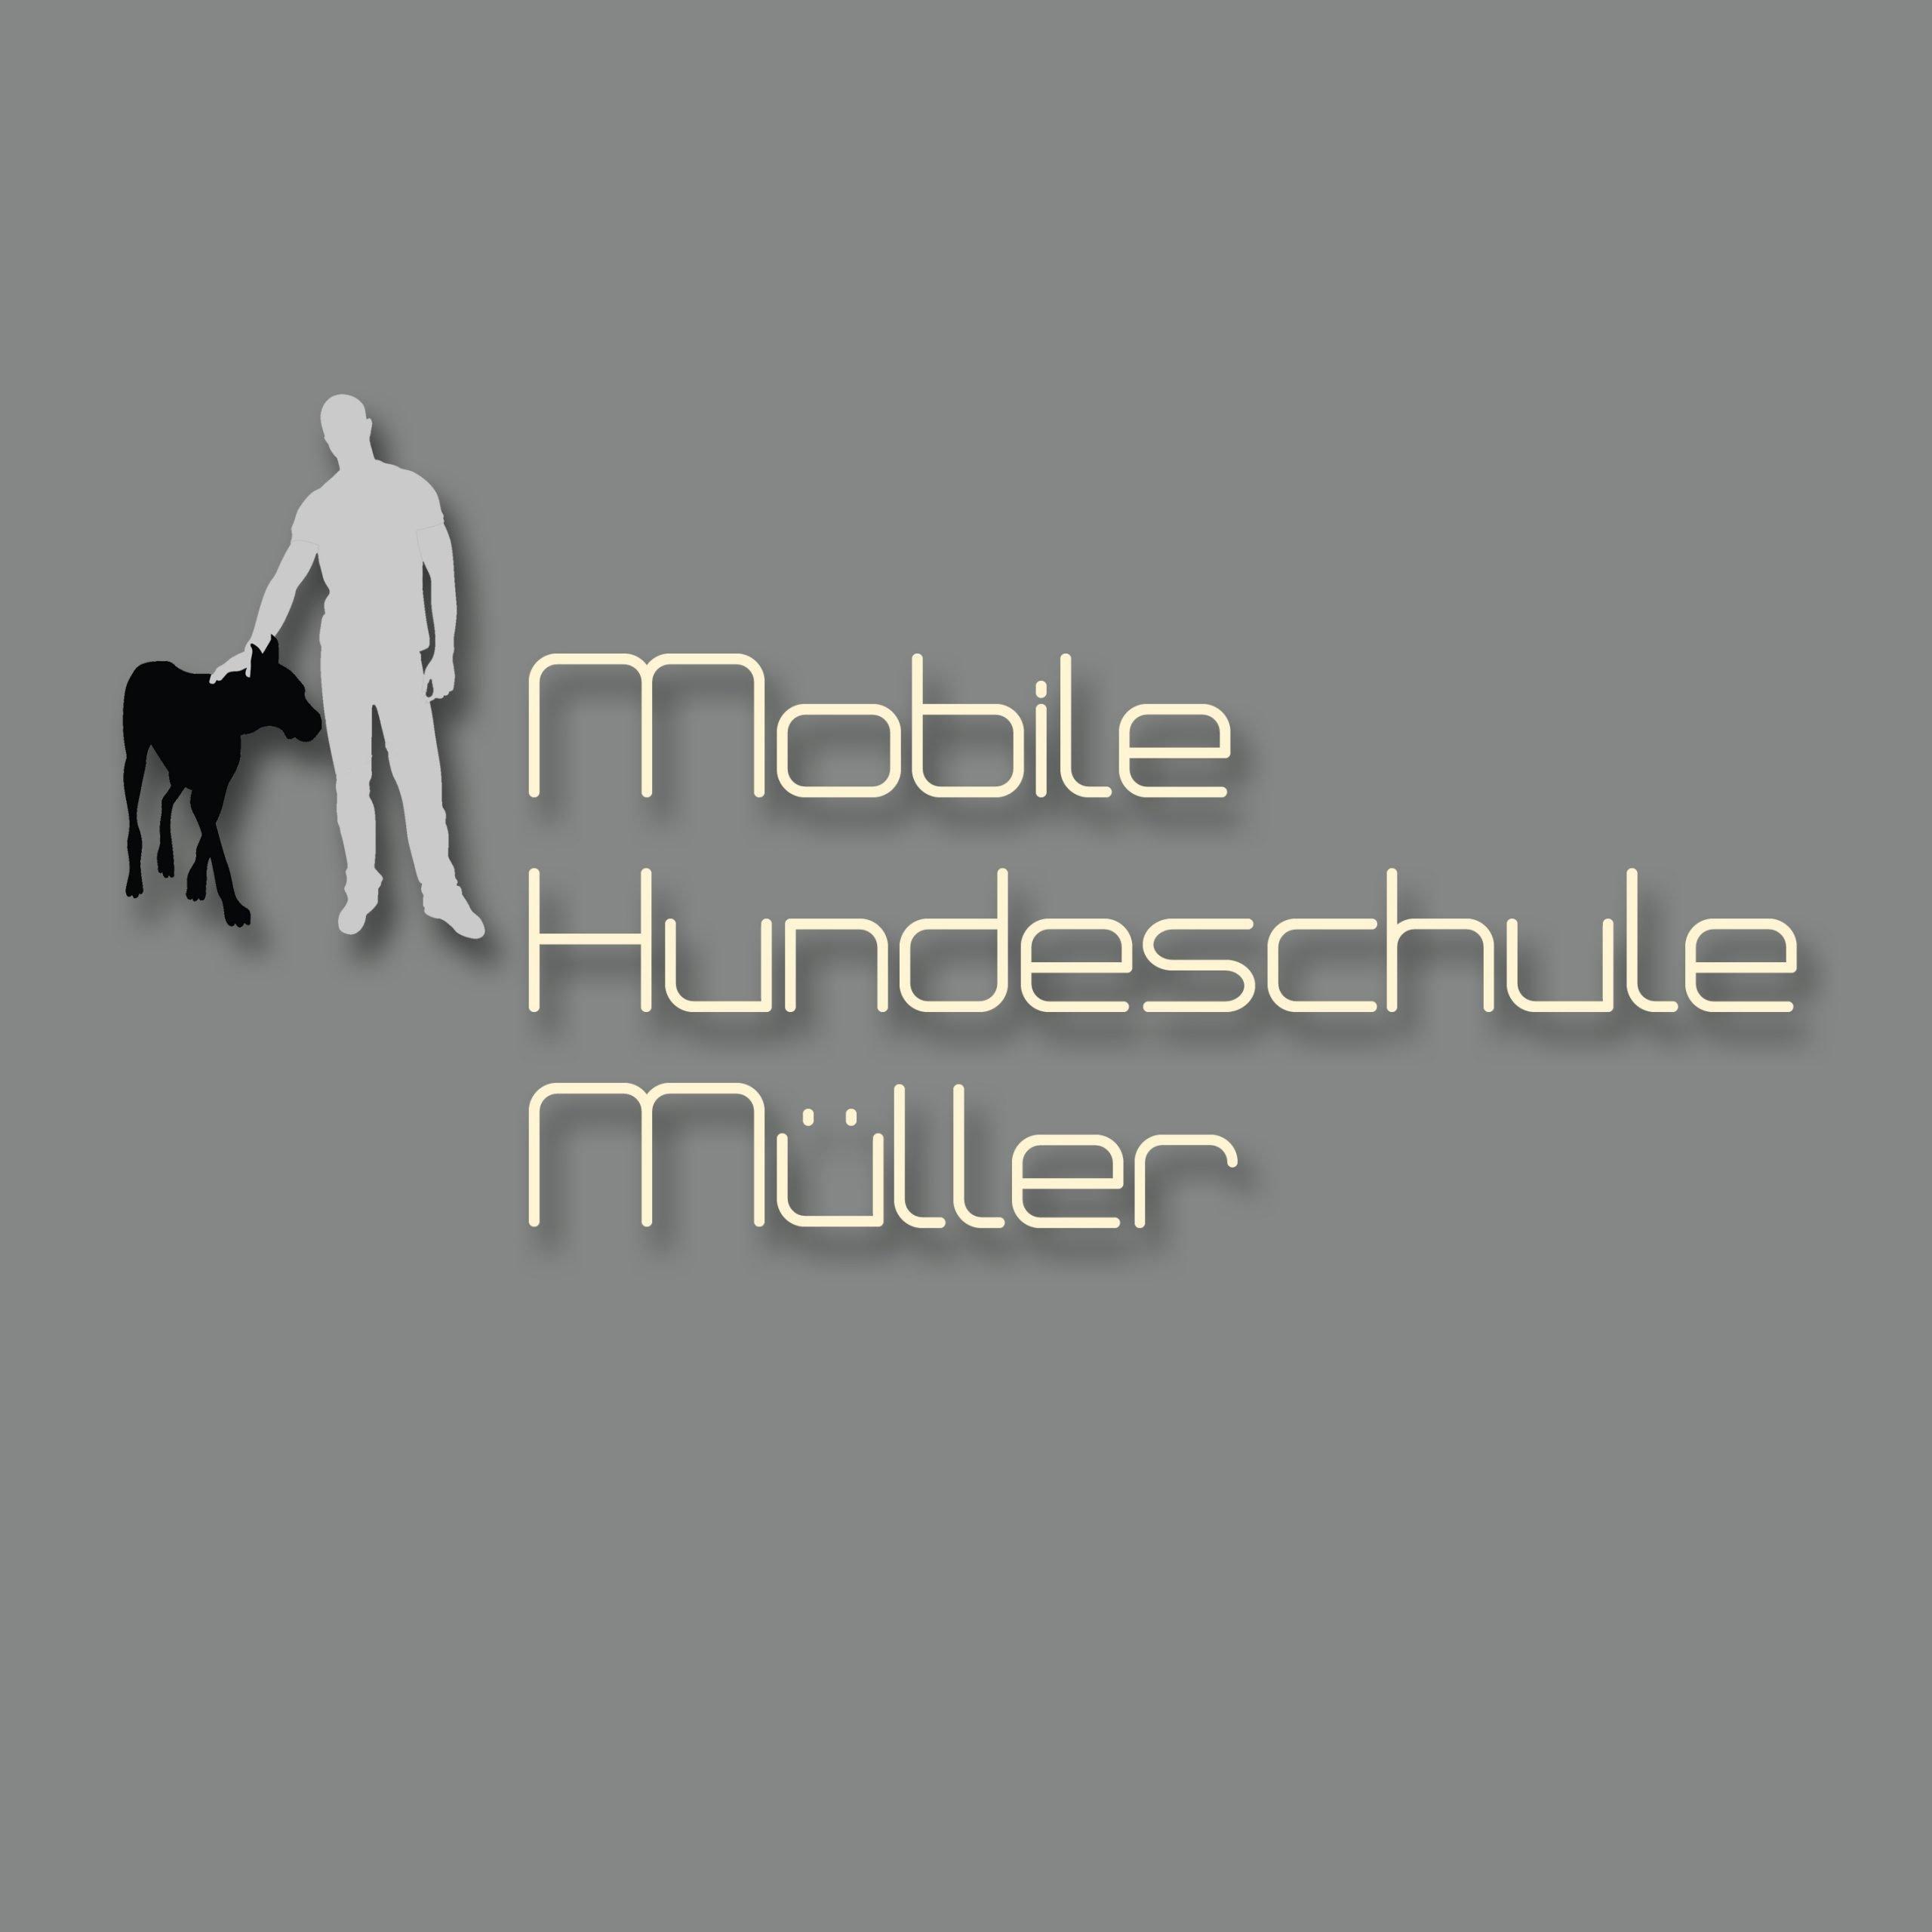 Mobile Hundeschule Müller